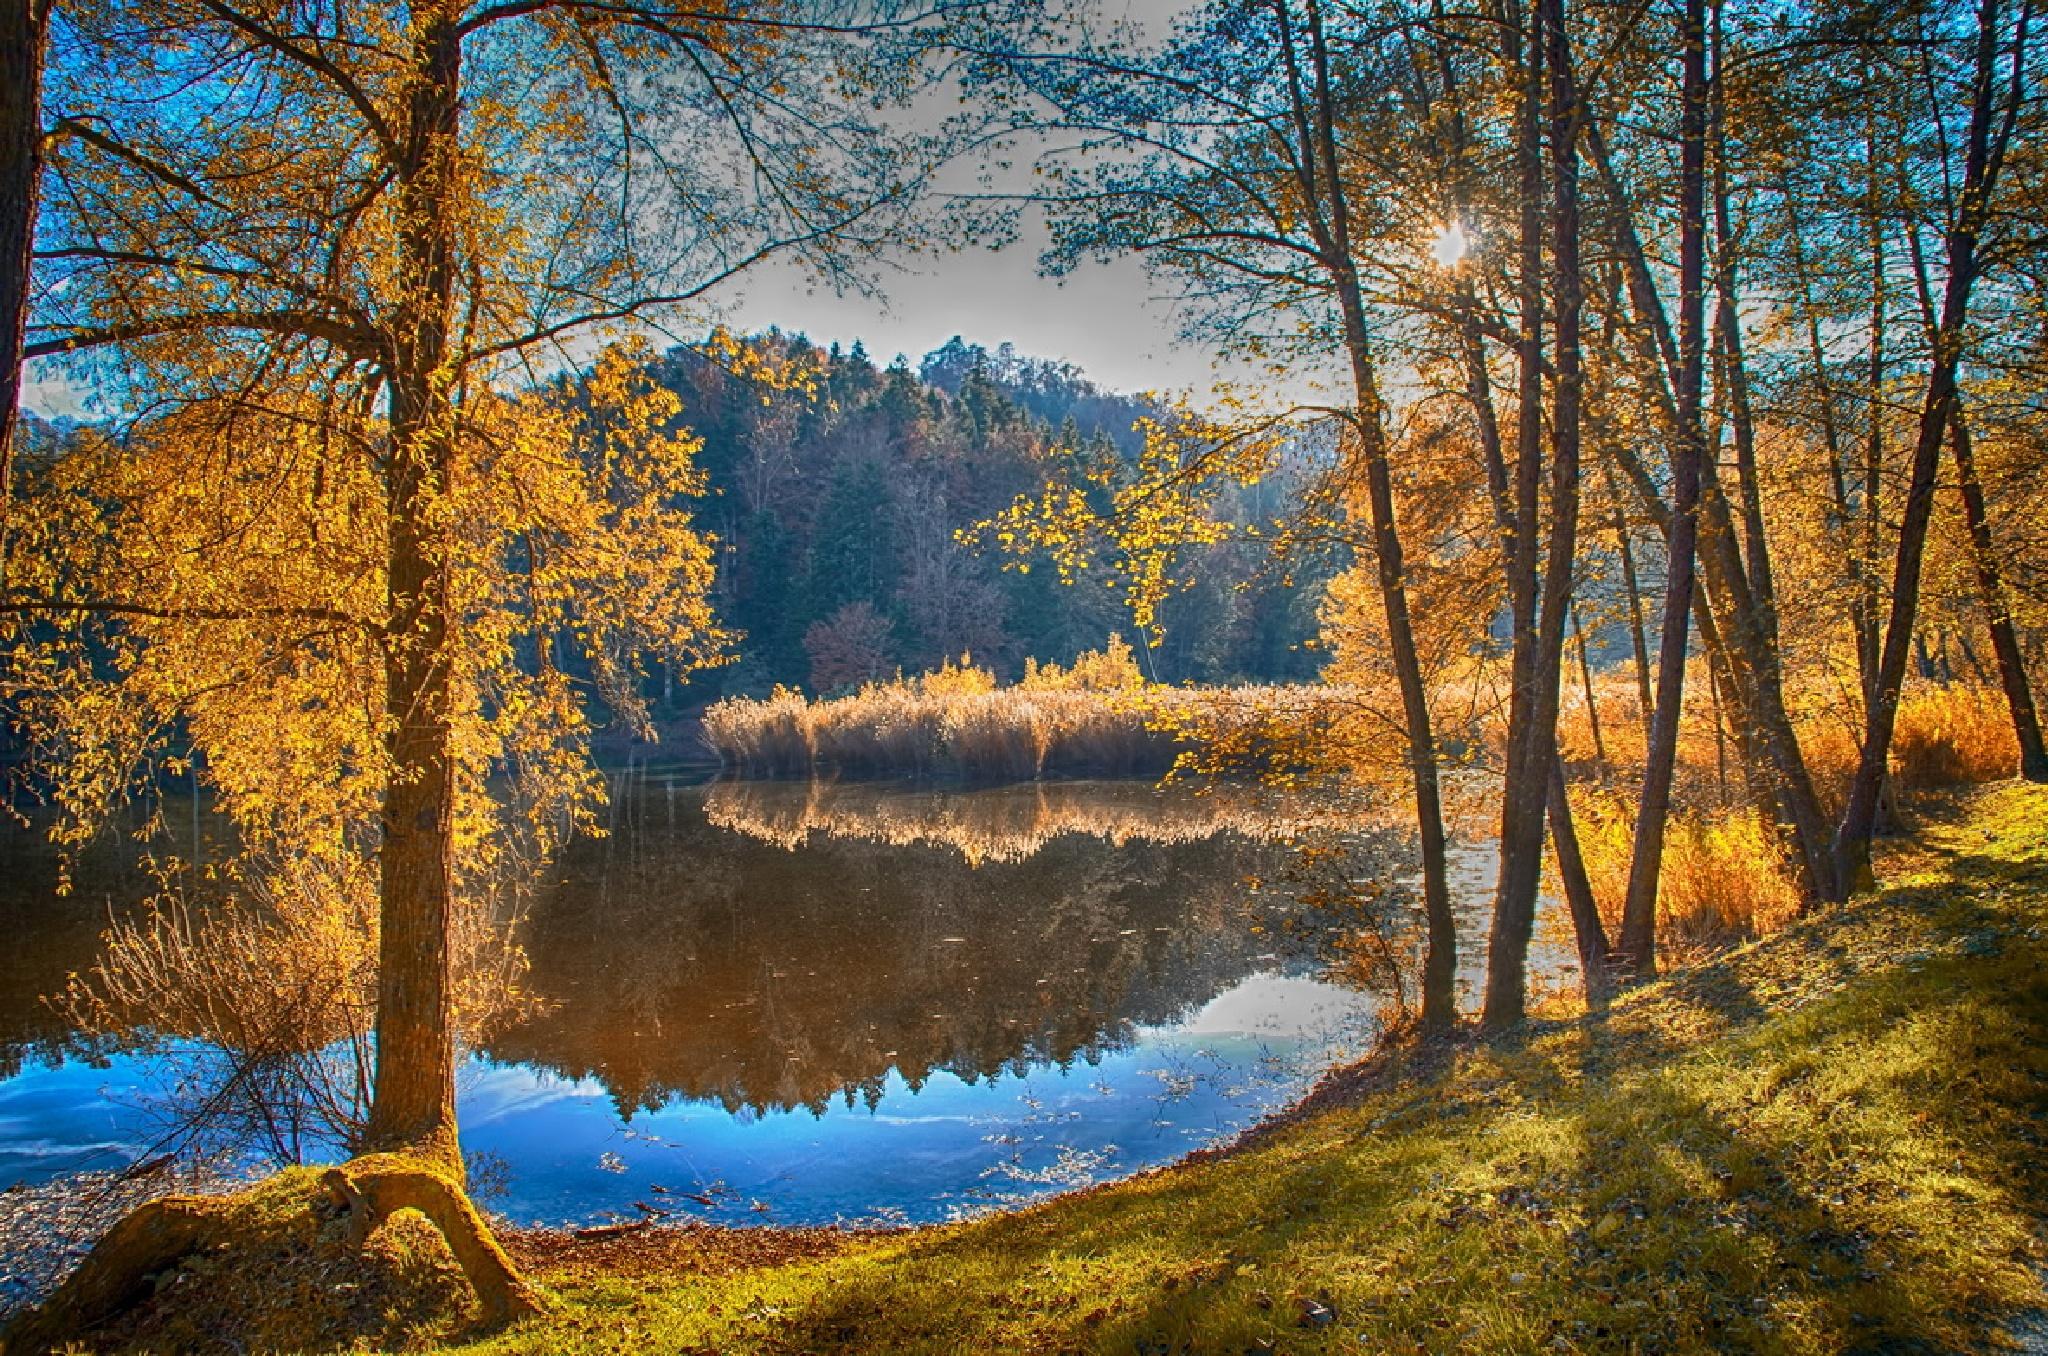 Sun shadows by Irena Trkulja